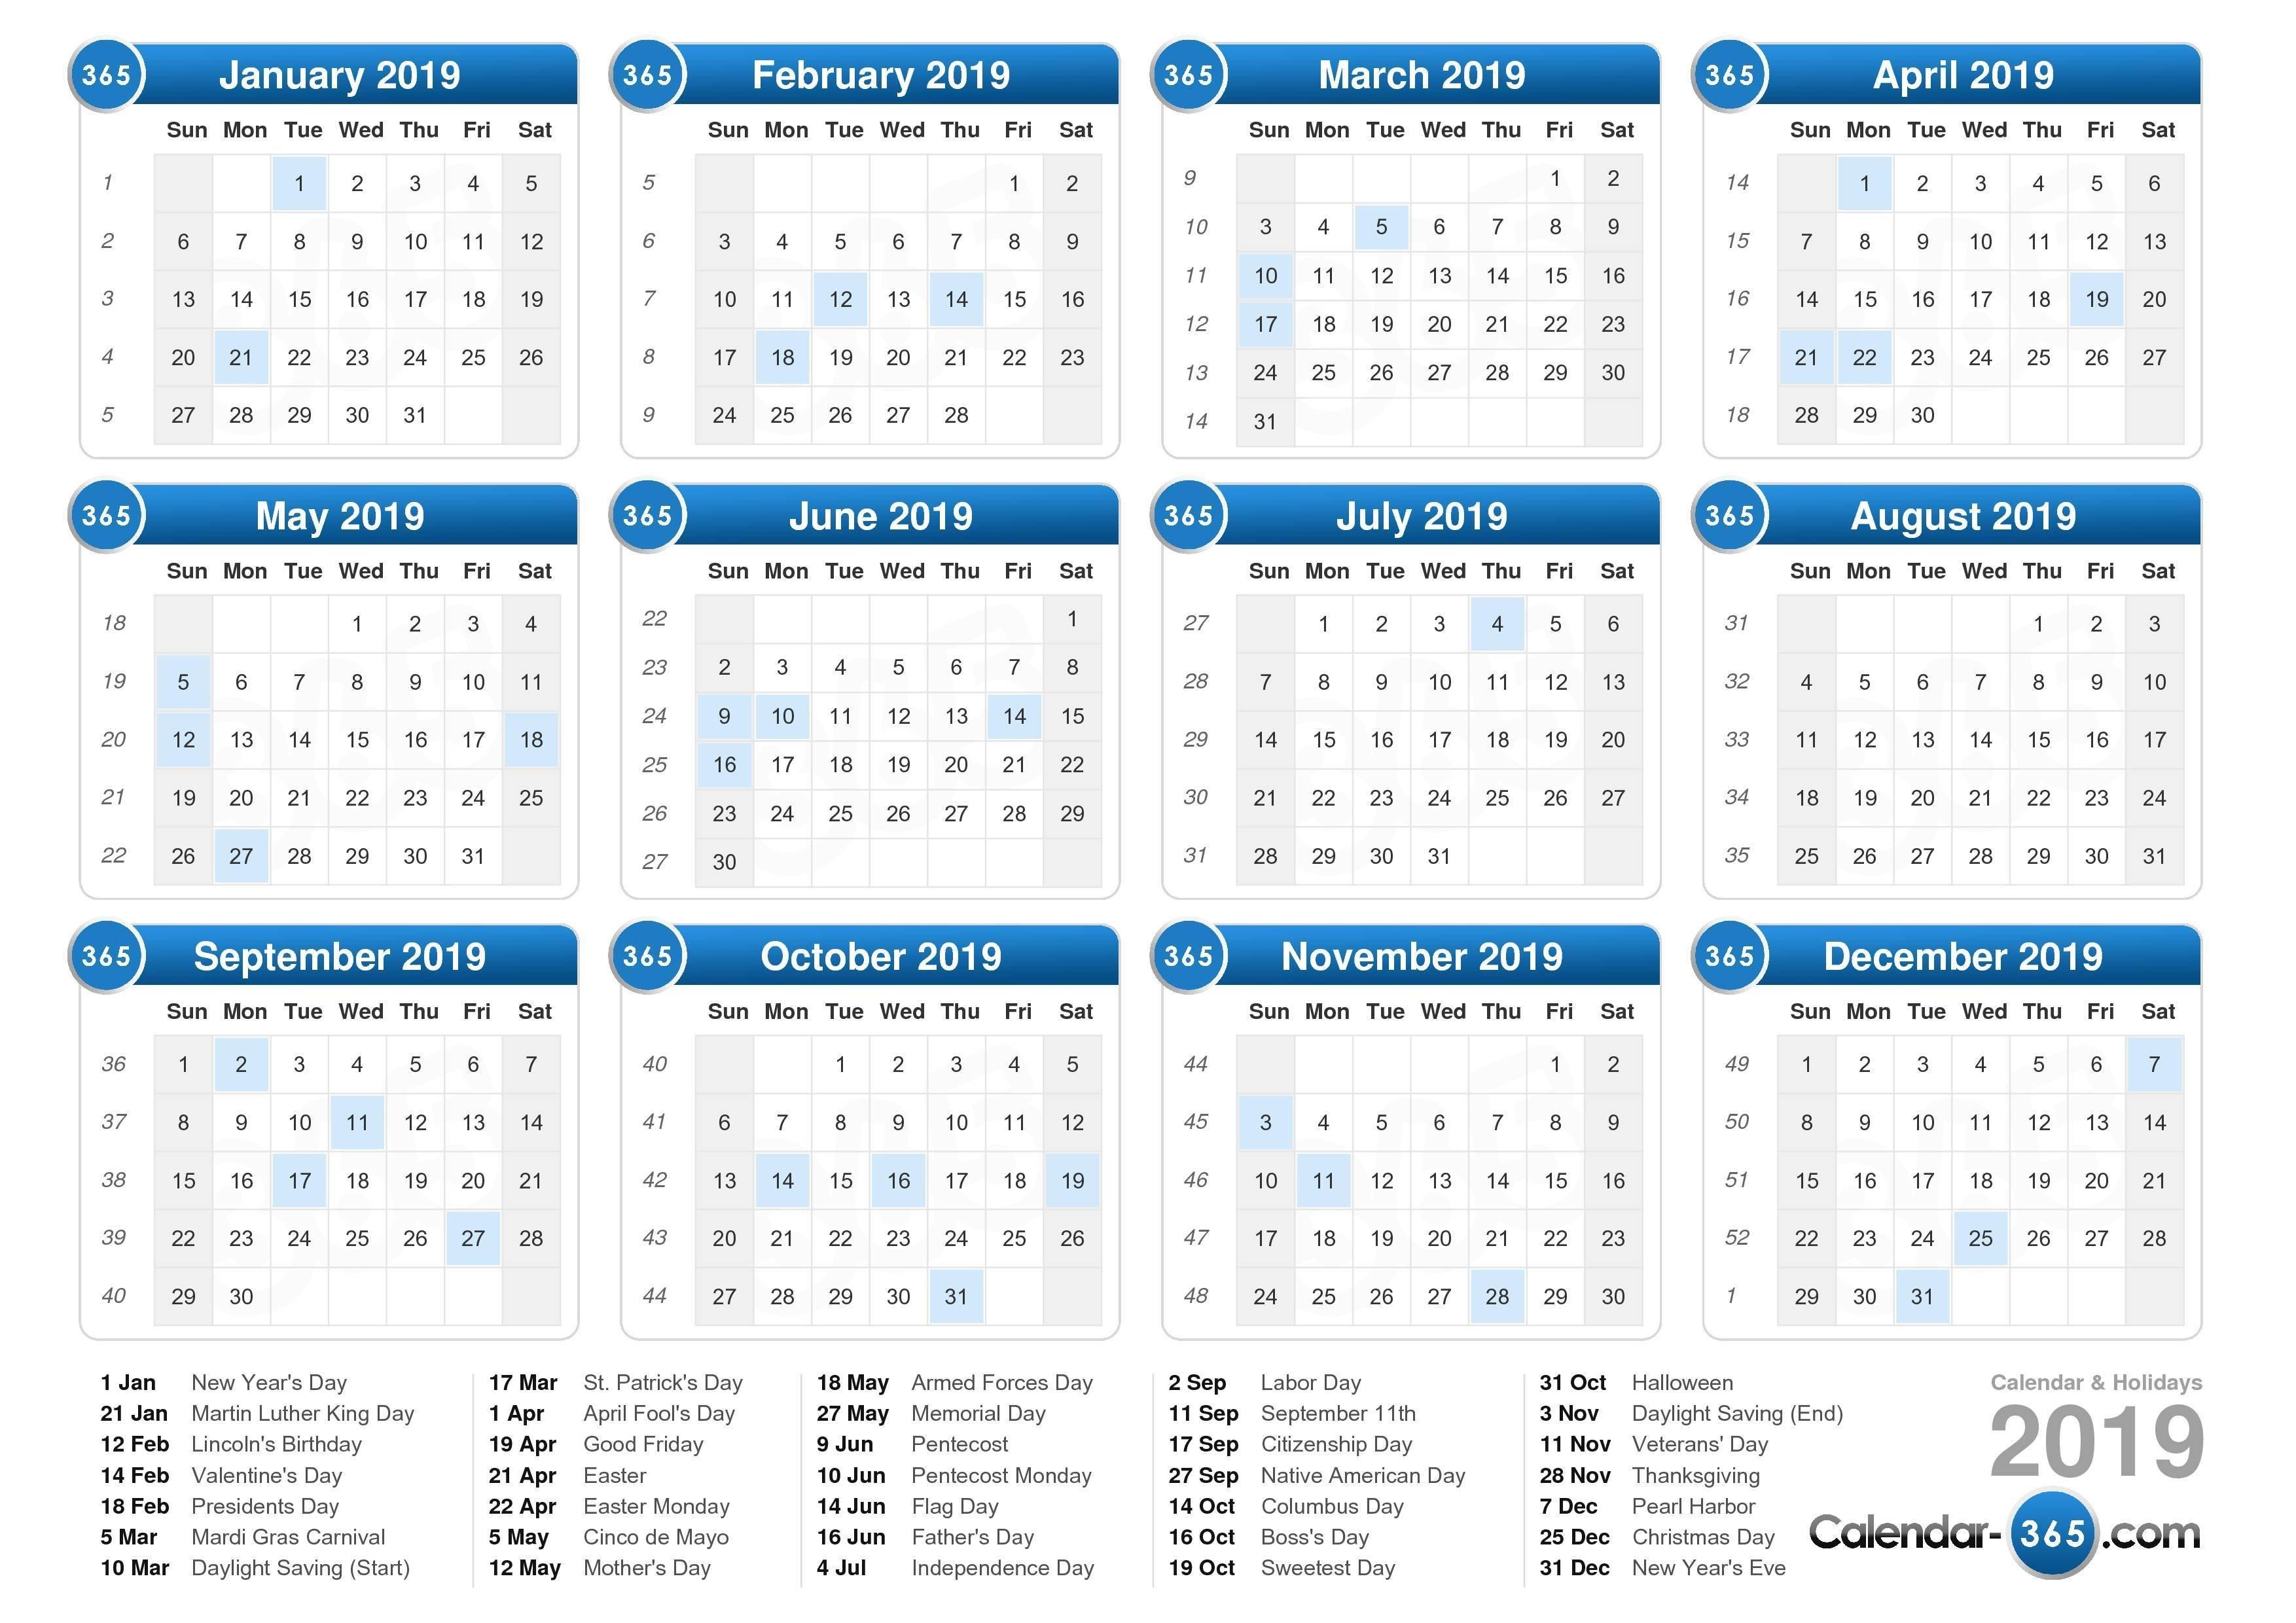 2019 Calendar 2019 Calendars